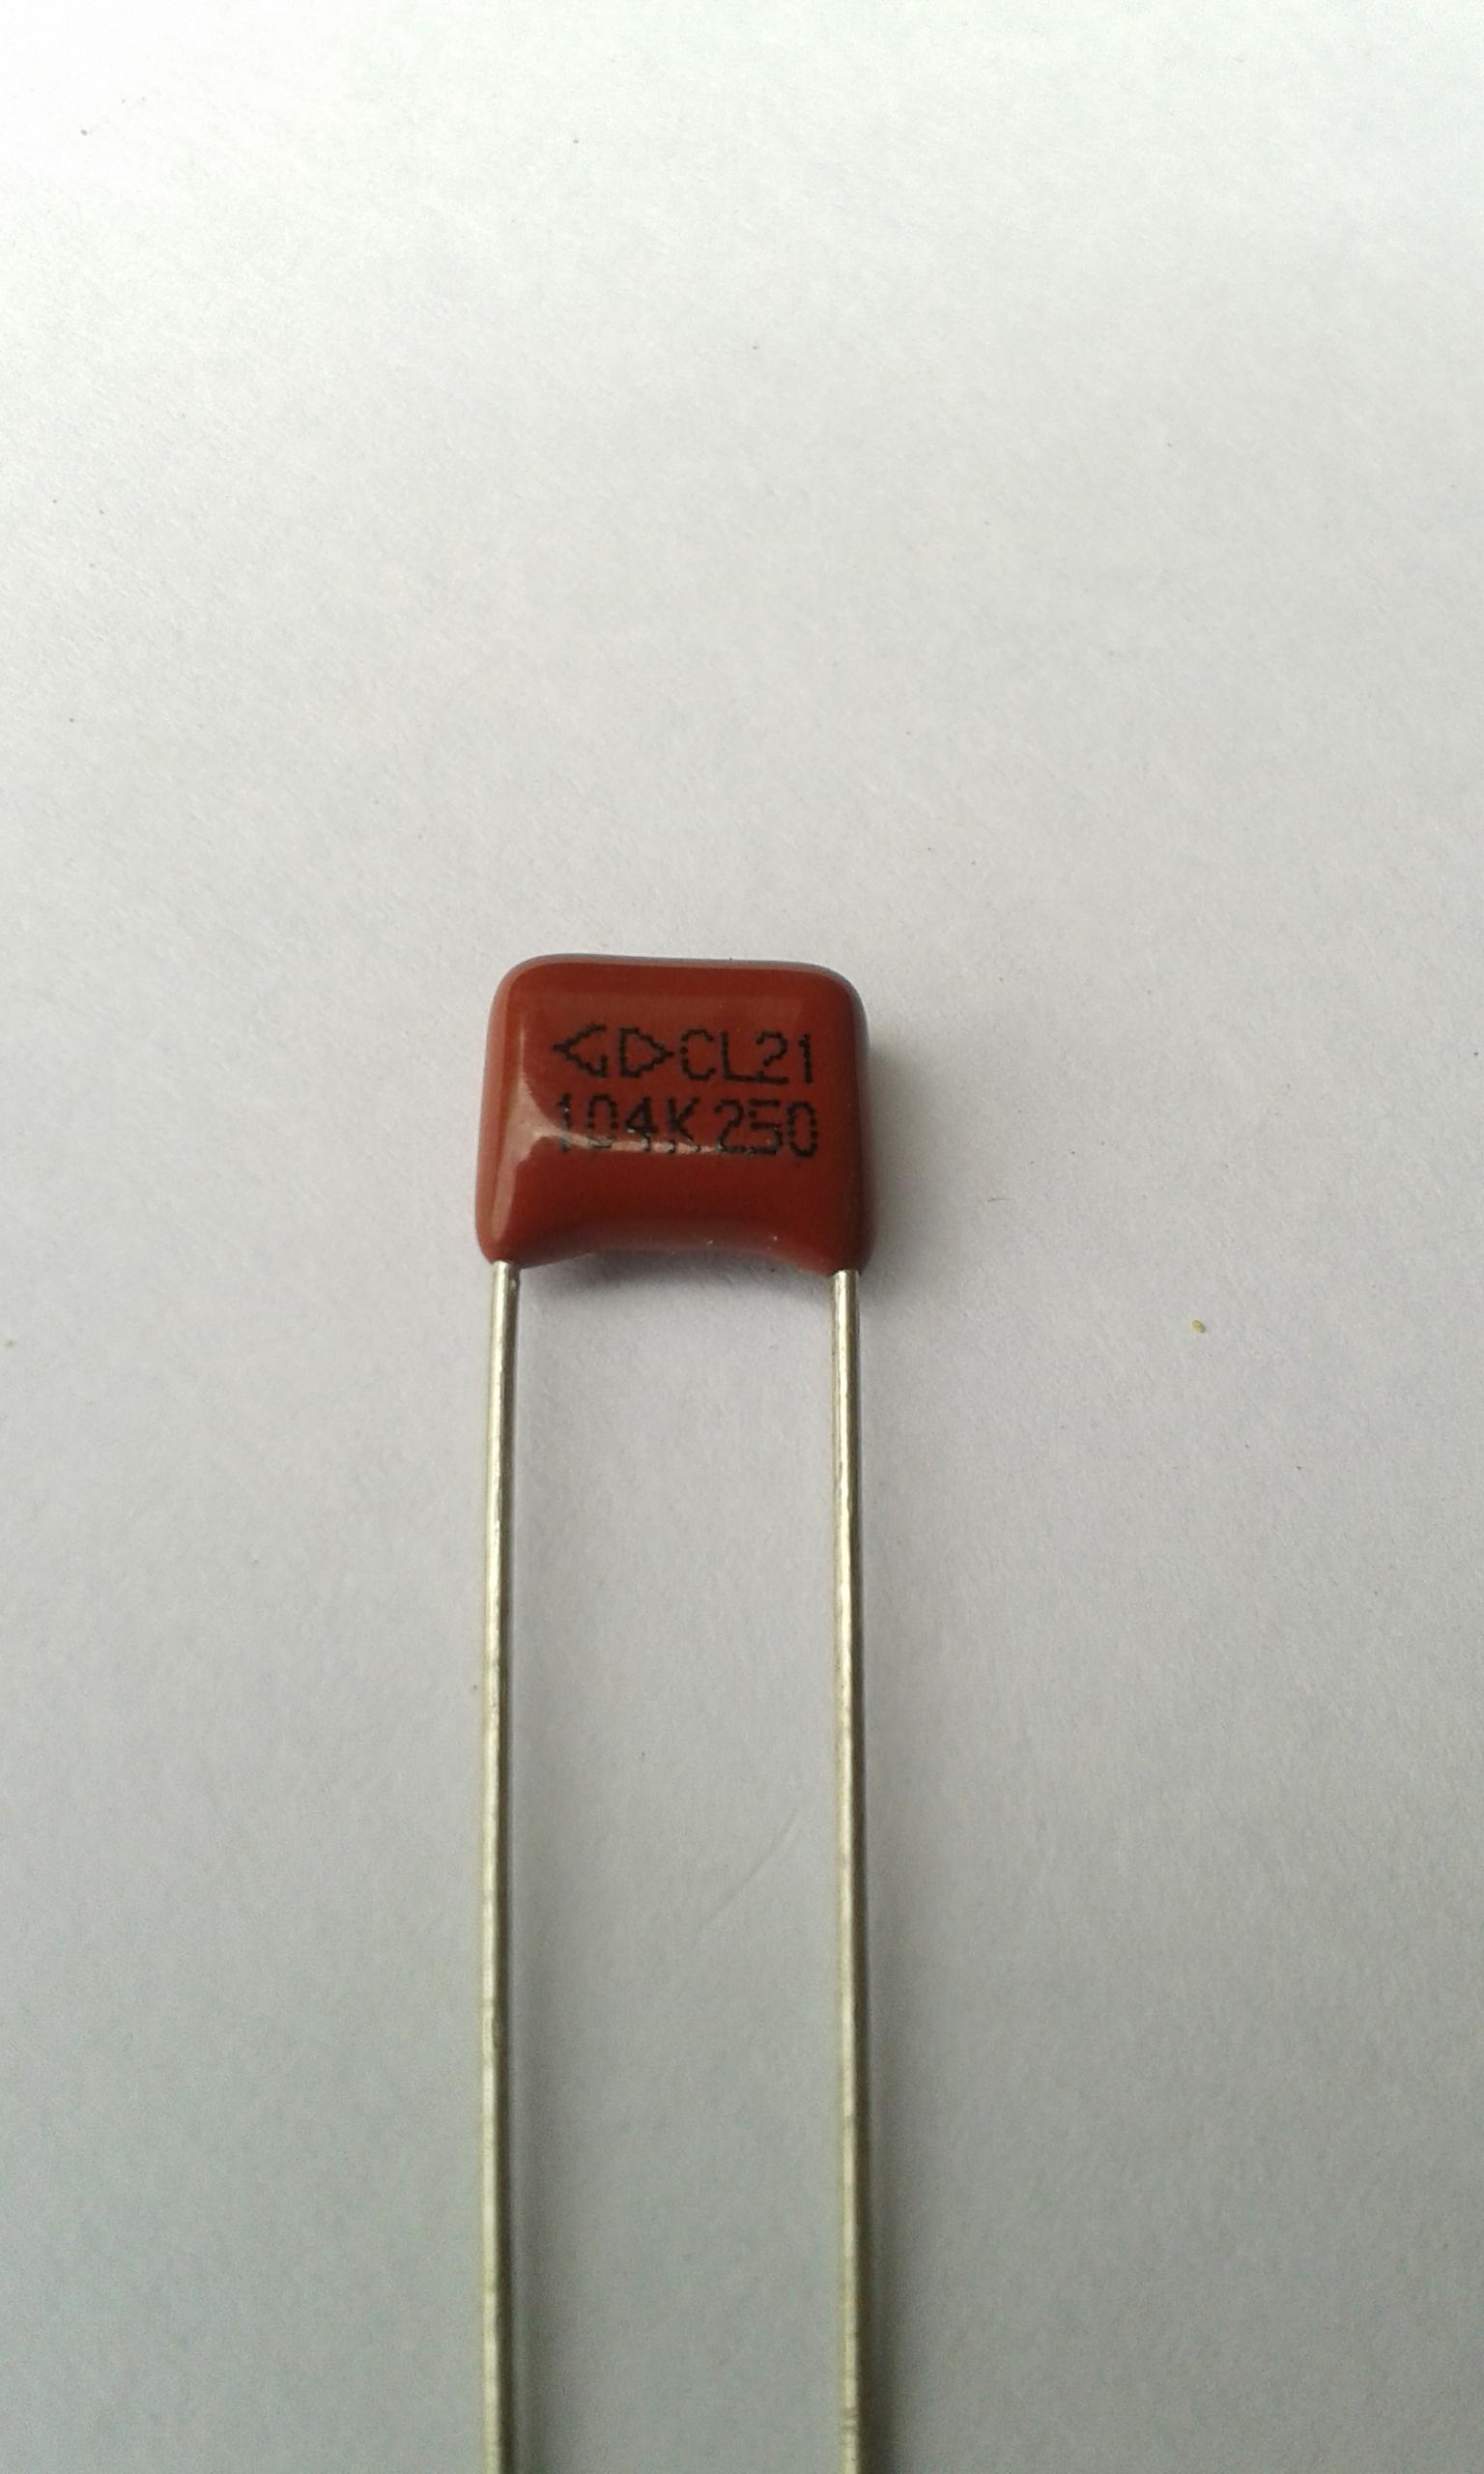 C 104 (100nF , 0.1uF) 250V